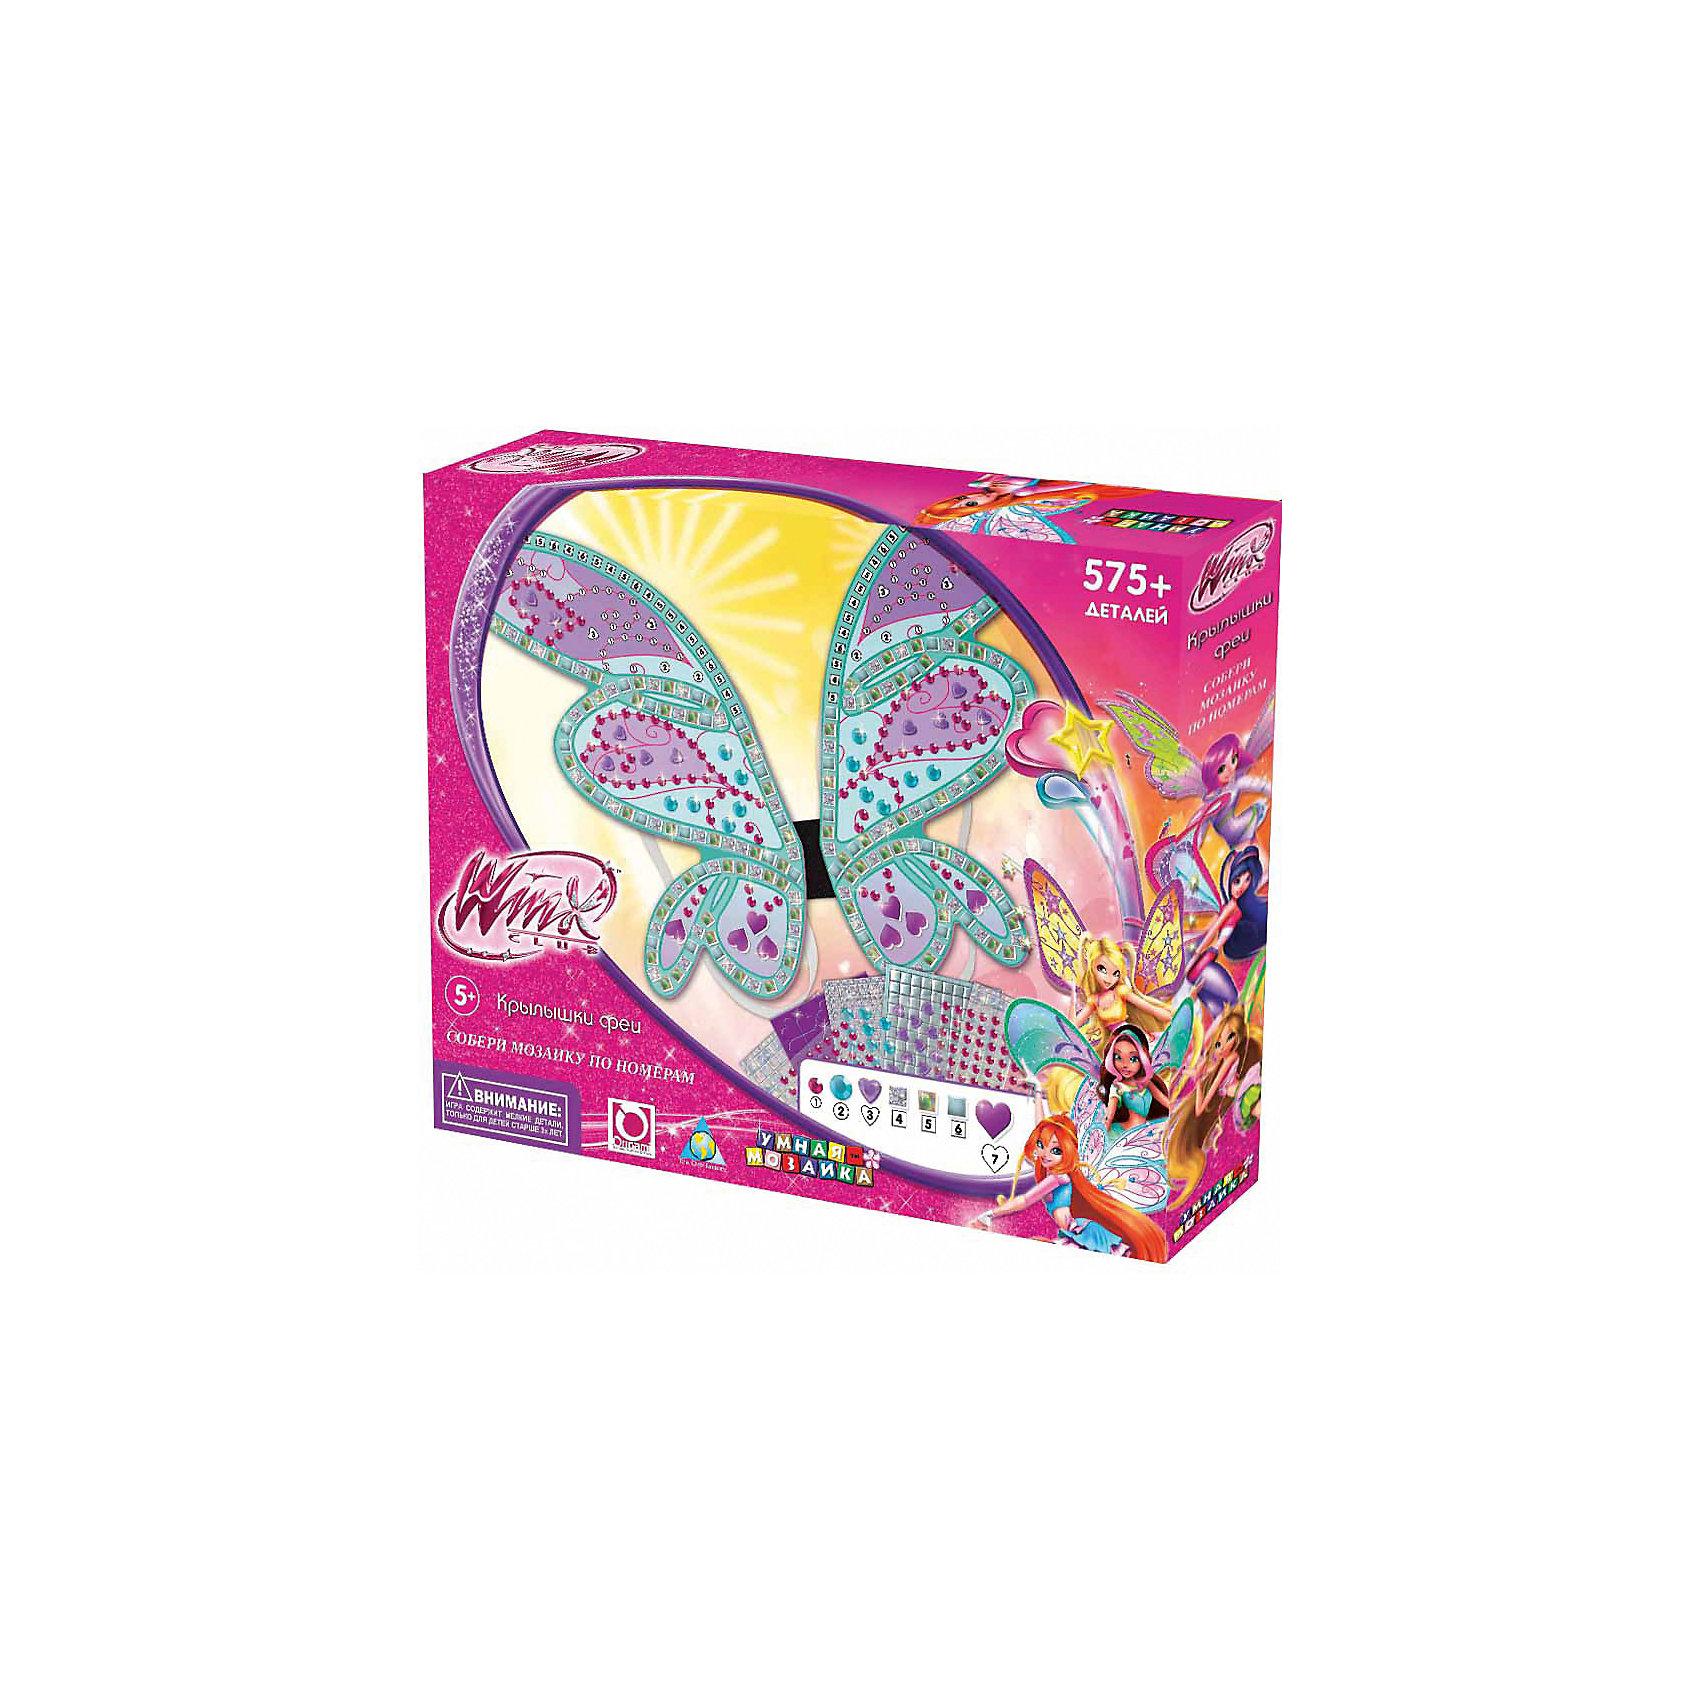 "Мозаика Winx Club ""Крылышки феи"", Оригами от myToys"